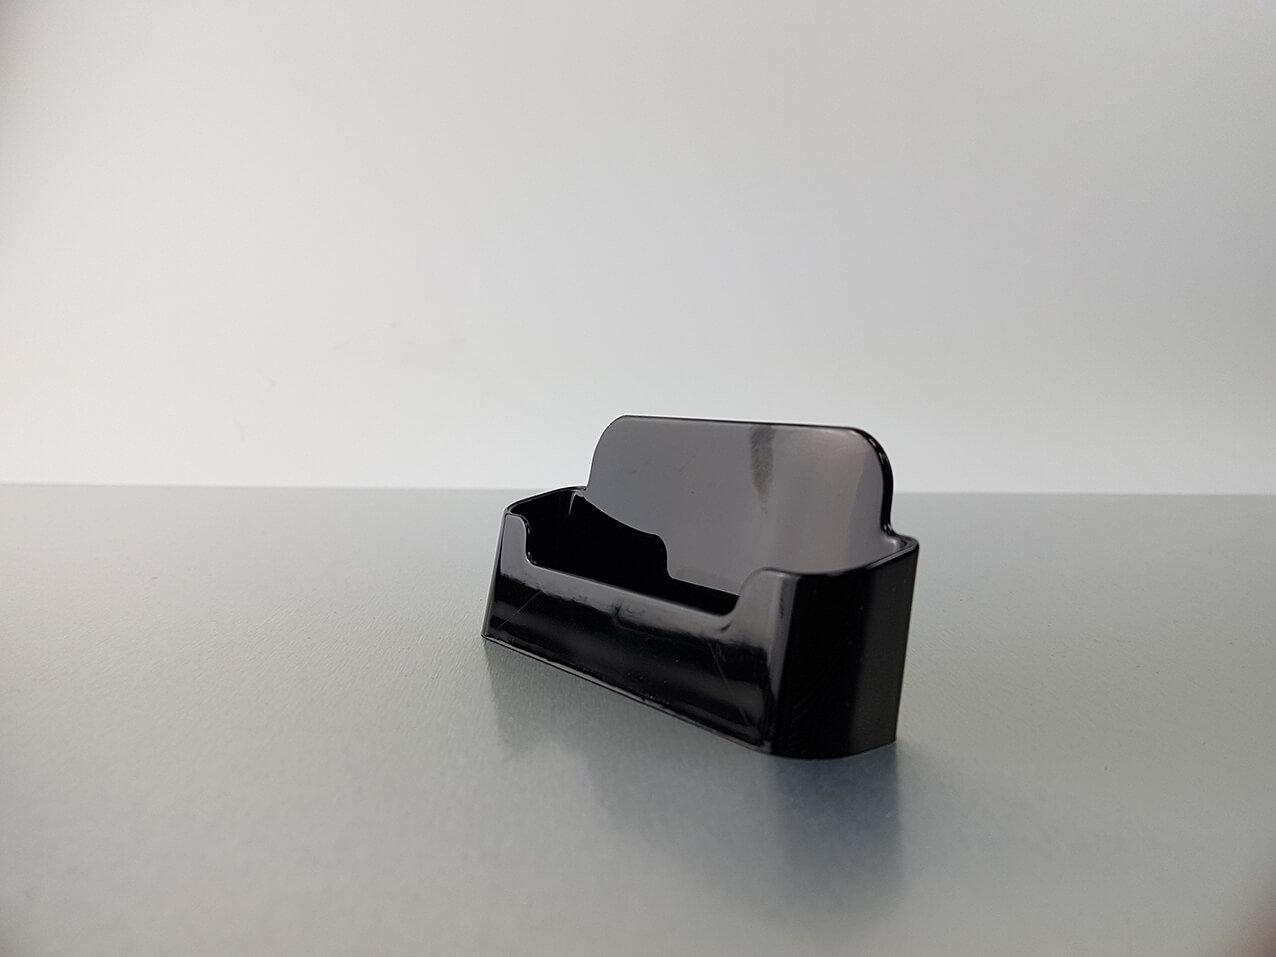 522-Visitenkartenhalter-schwarz-1213